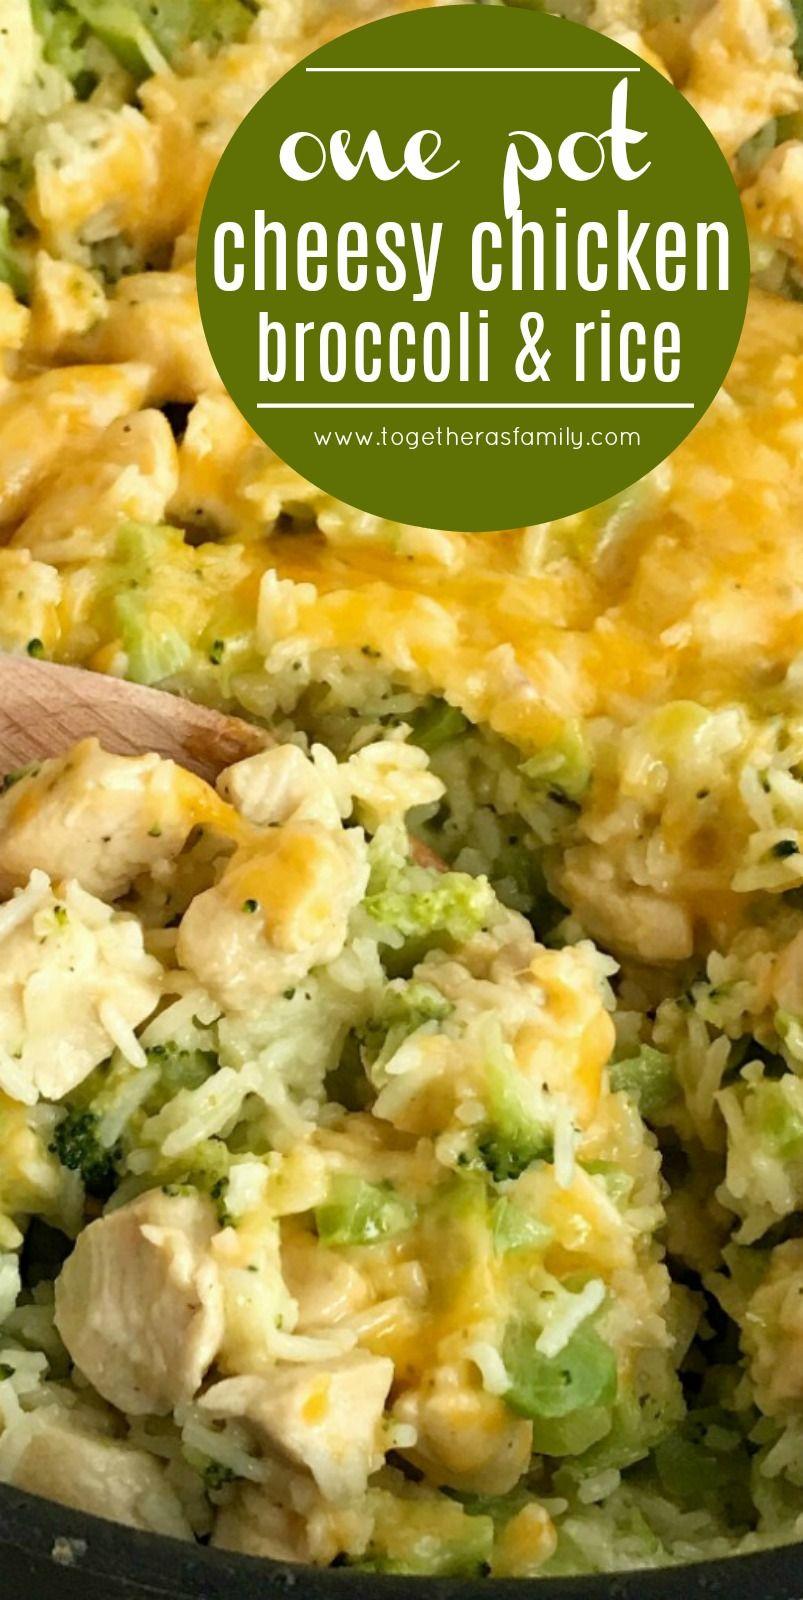 One Pot Cheesy Chicken Broccoli & Rice